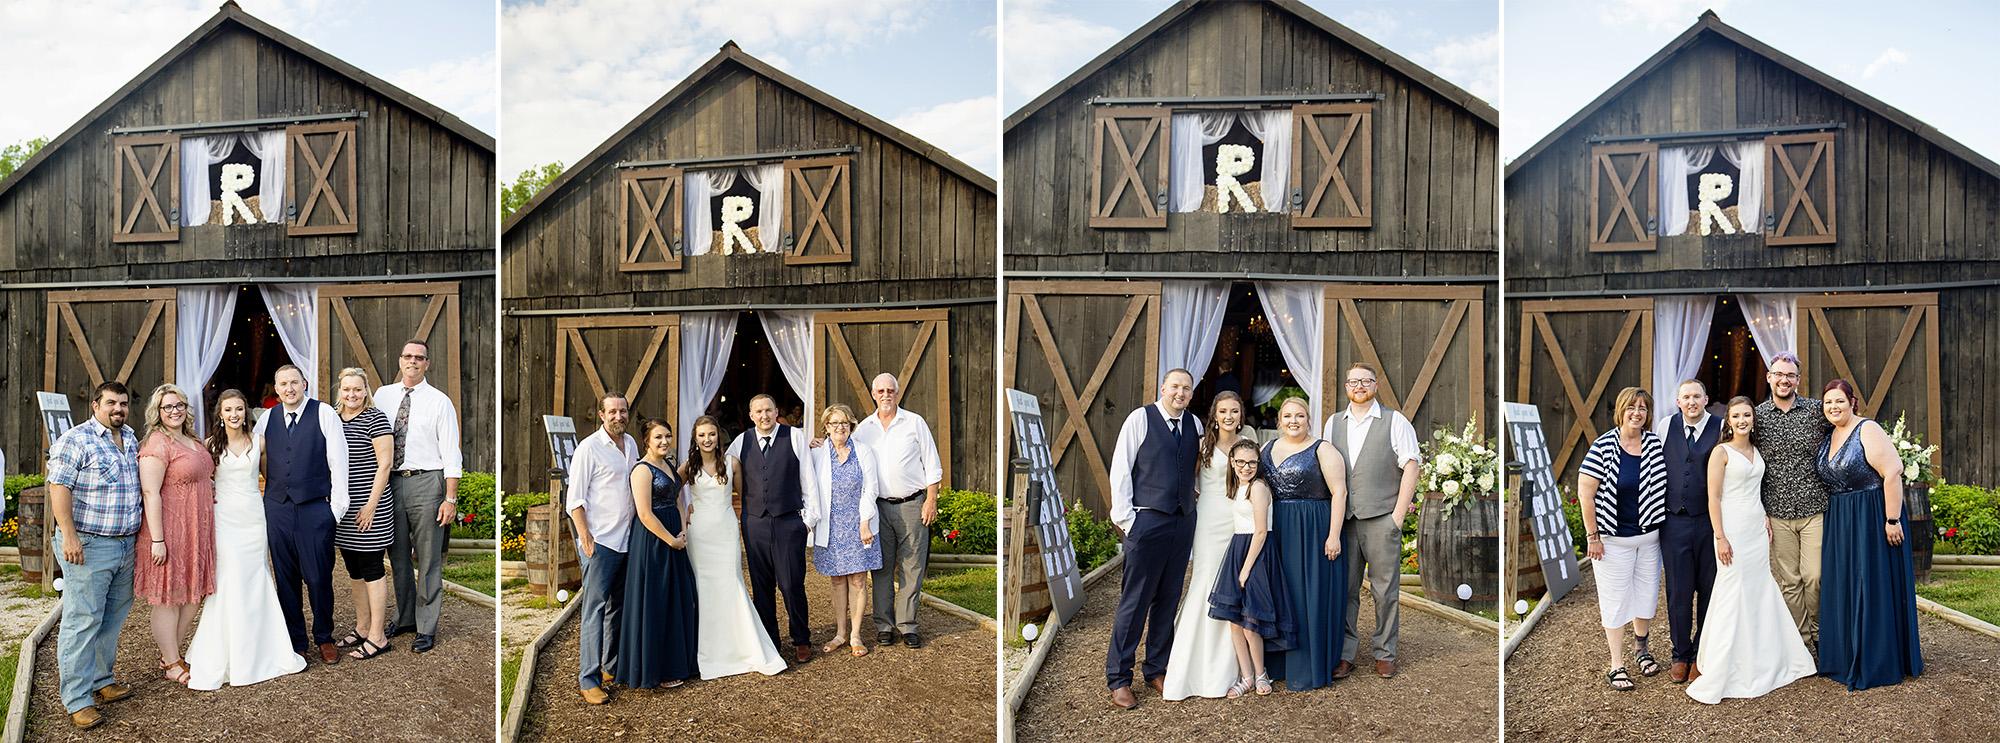 Seriously_Sabrina_Photography_Red_River_Gorge_Wedding_Barn_Robinson110.jpg